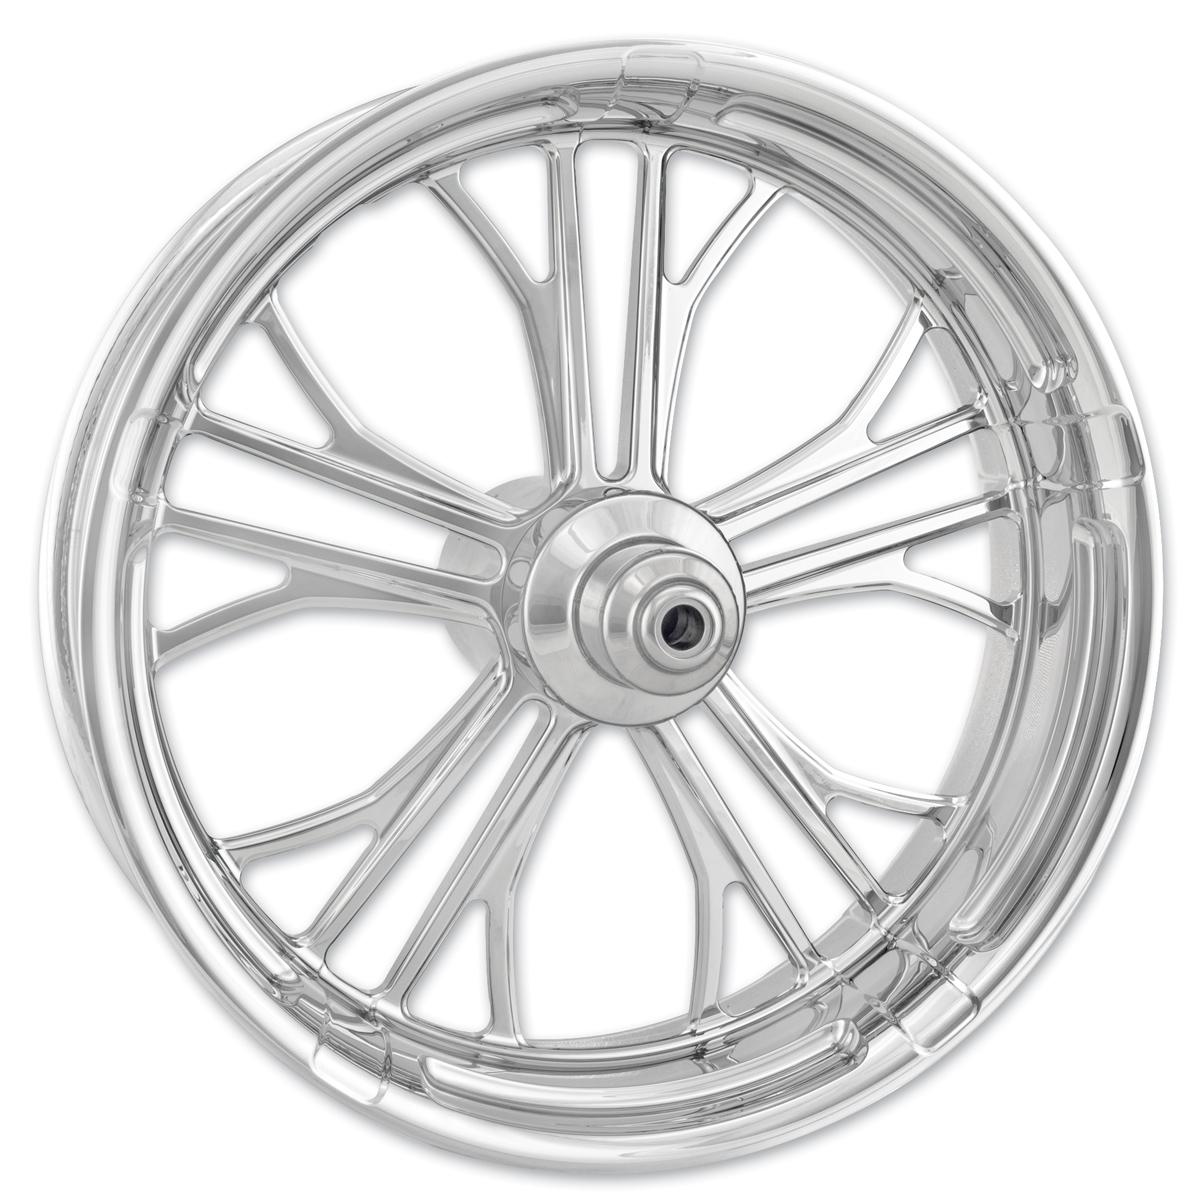 Performance Machine Dixon Chrome Front Wheel 21x2.15 With PM Disc